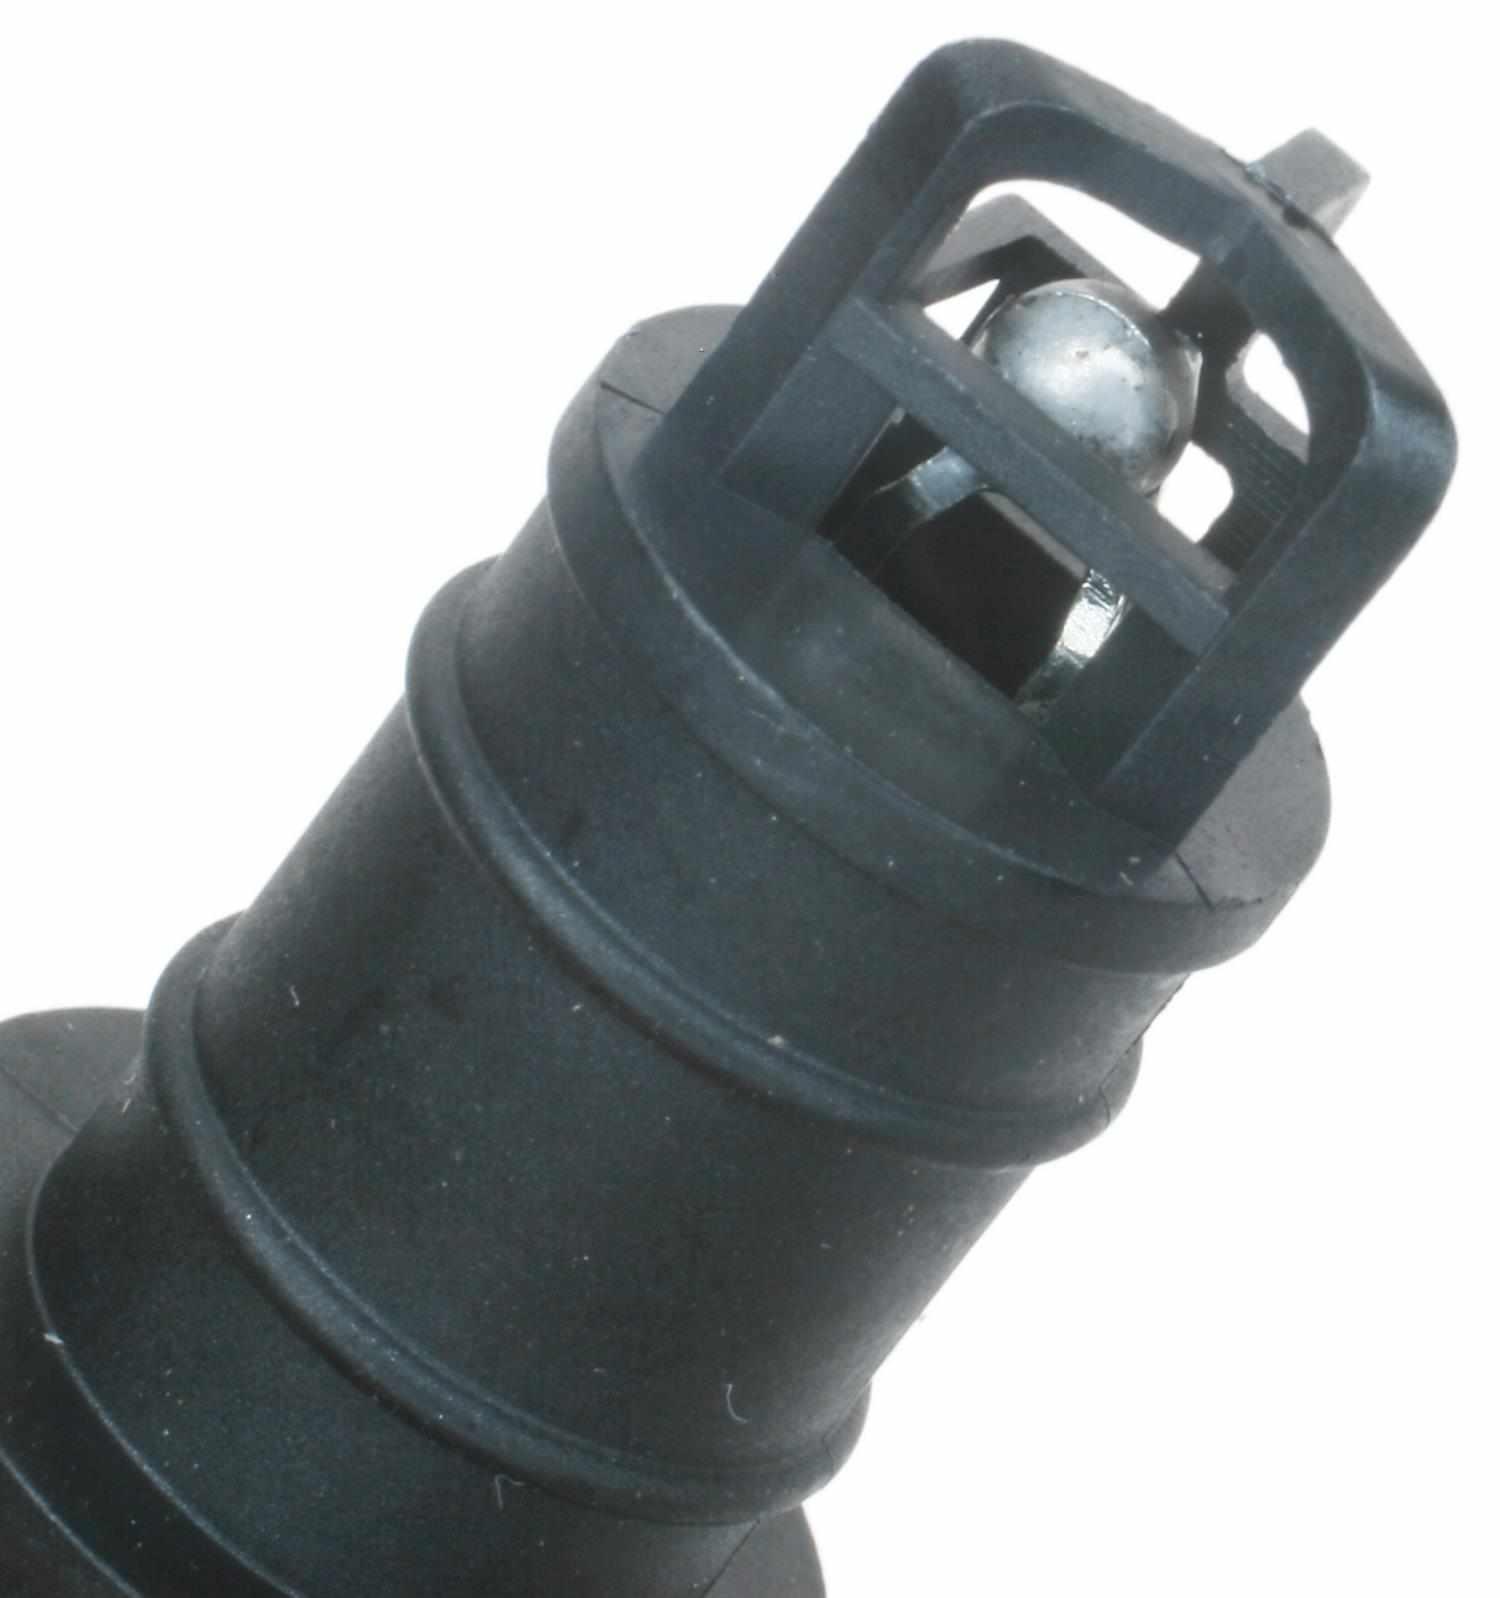 ACDELCO PROFESSIONAL - Engine Intake Manifold Temperature Sensor - DCC 213-4663